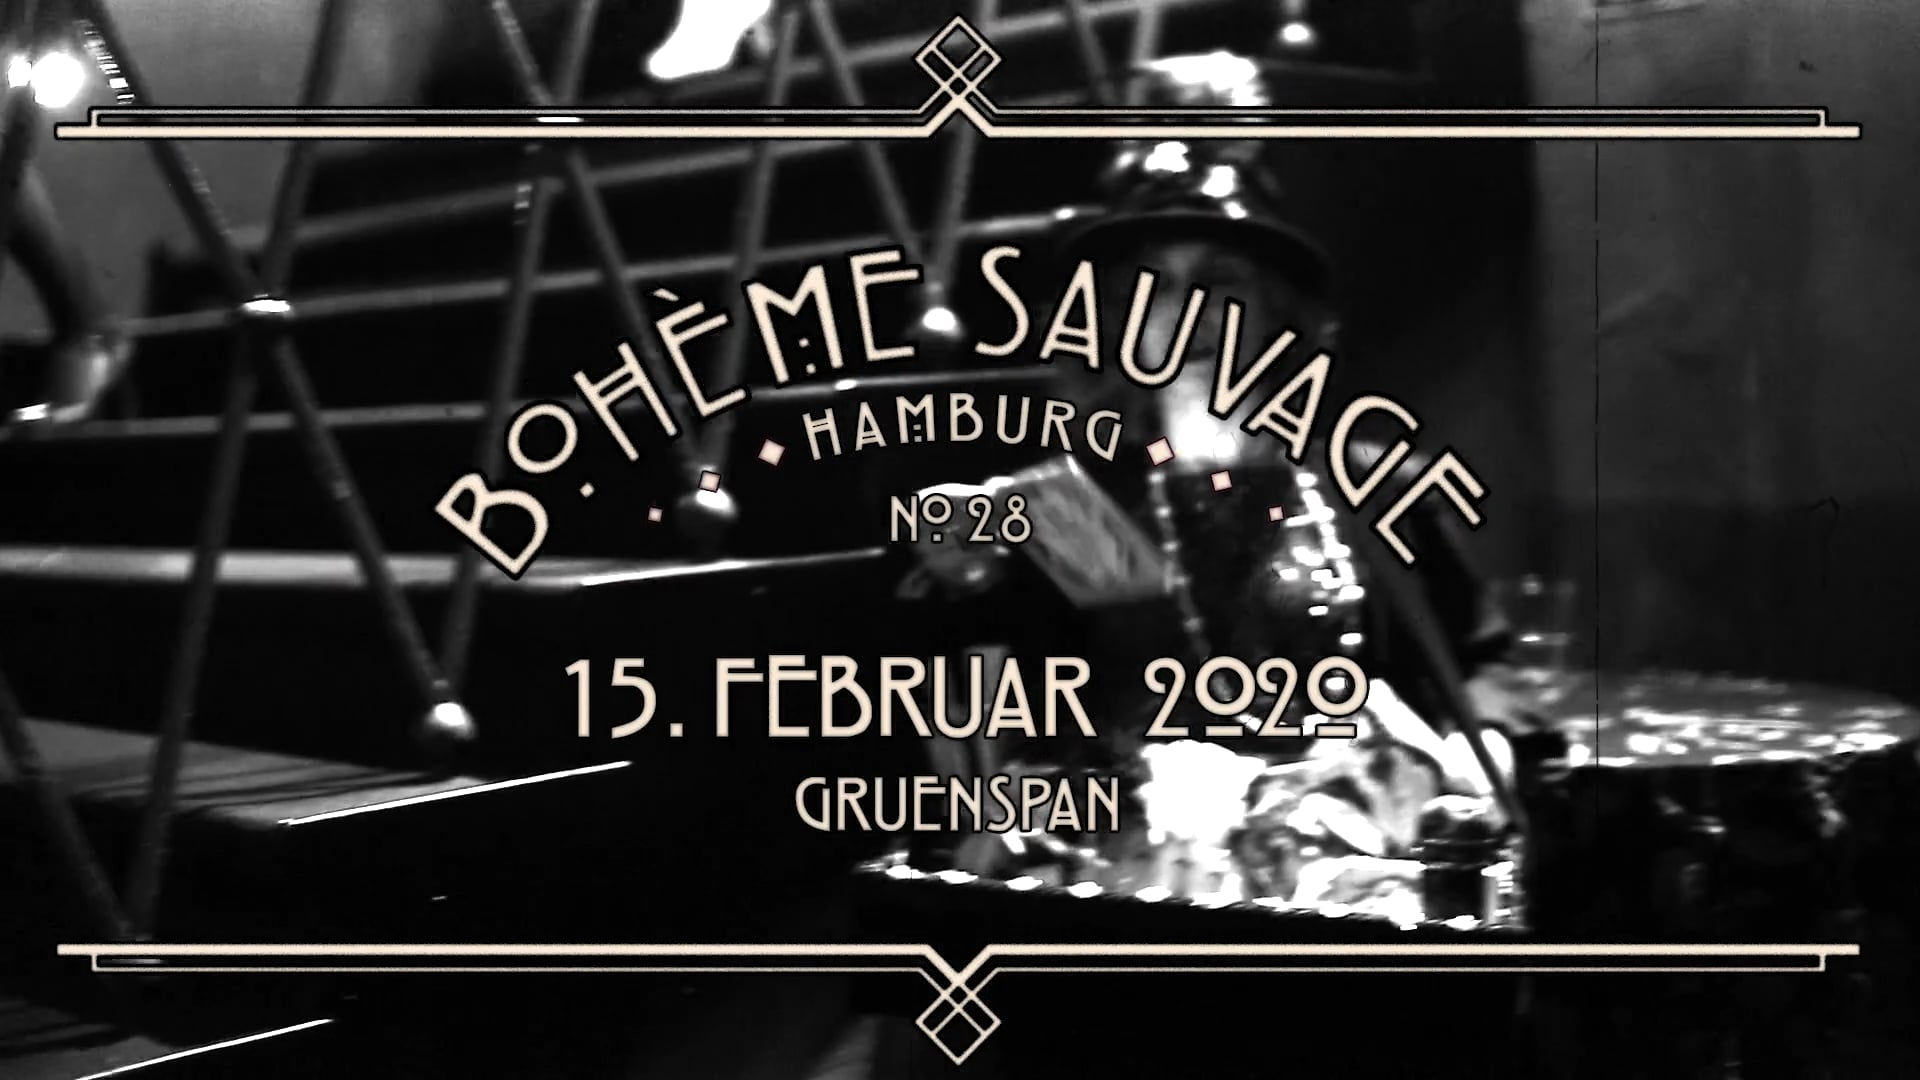 Bohème Sauvage